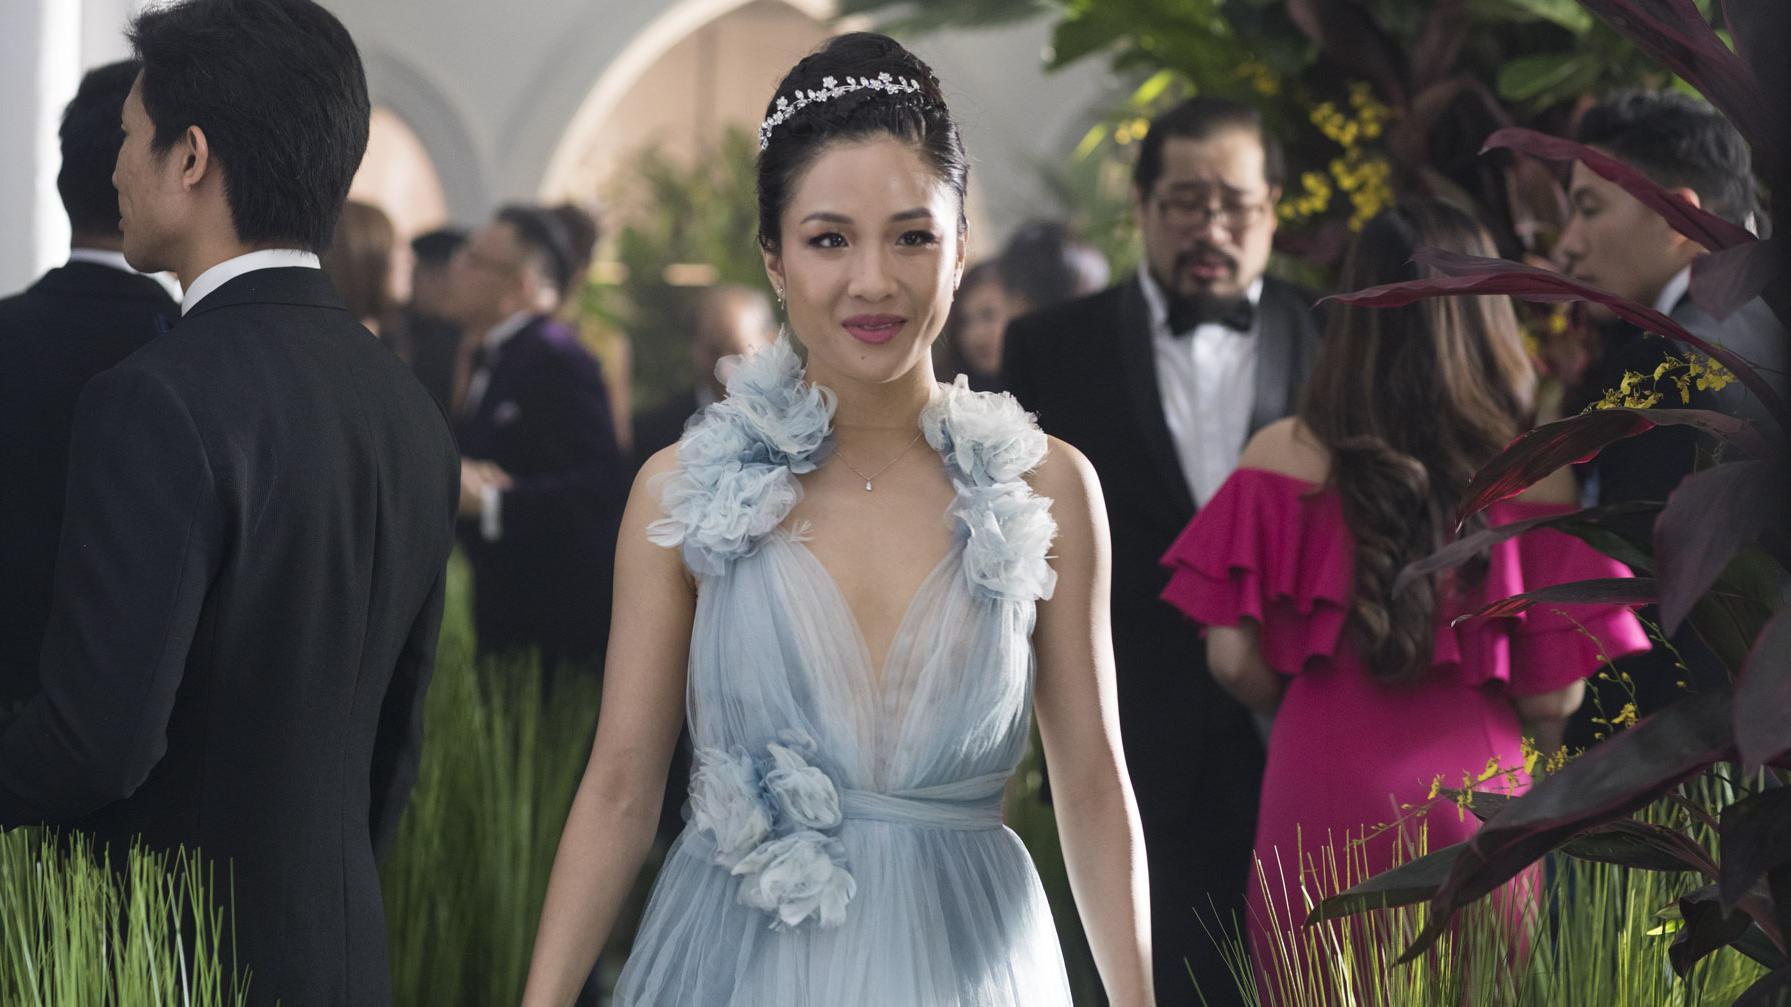 Inside The Crazy Rich Asians Wedding